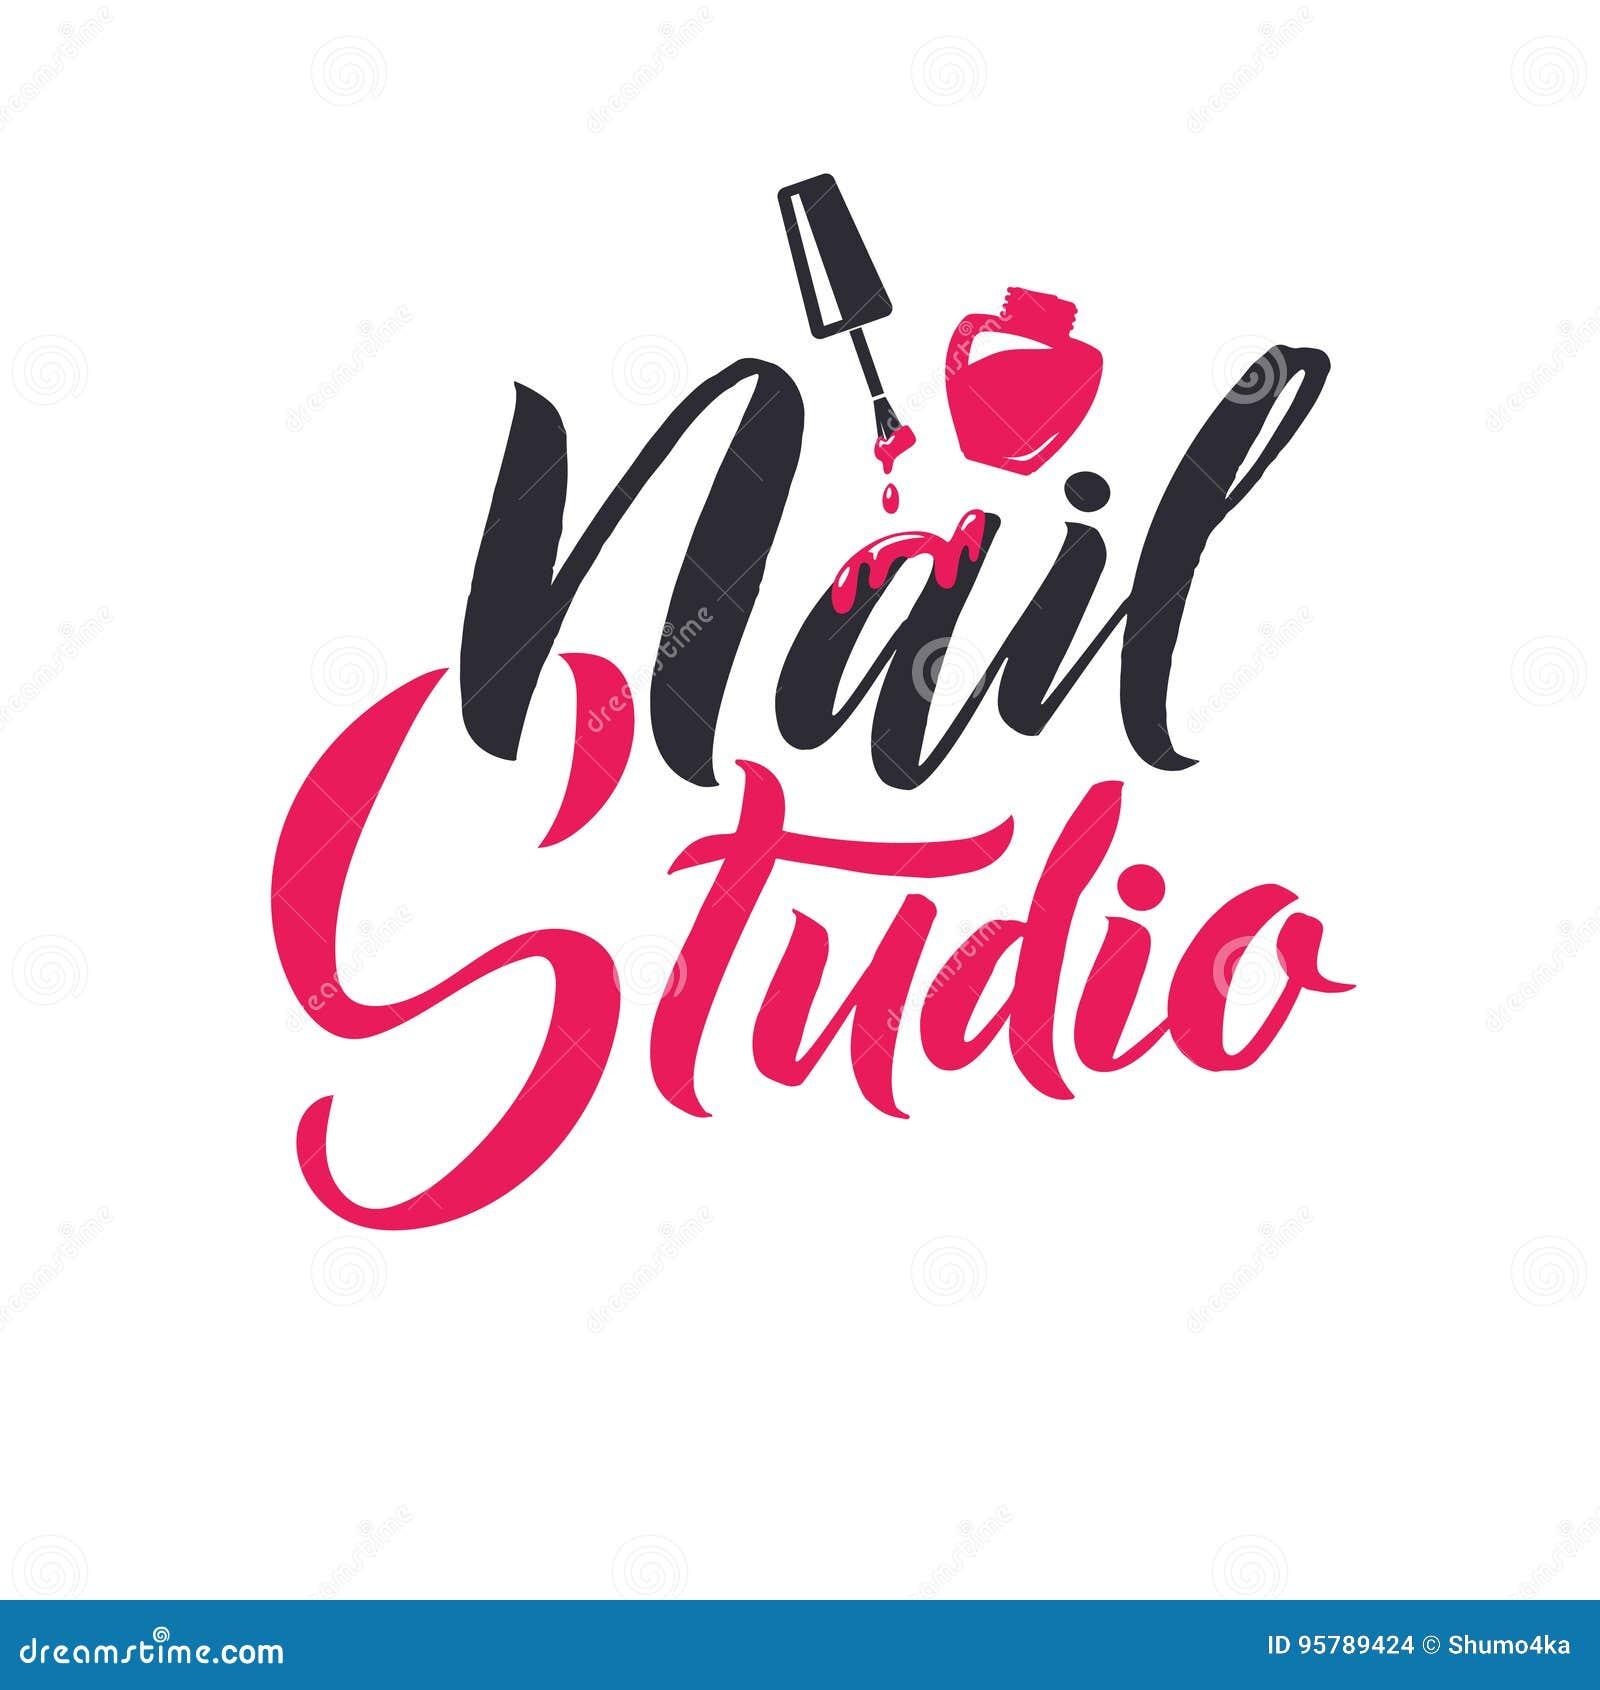 manicure-studio-nail-master-logo-beauty-vector-lettering-custom-handmade-calligraphy-vector-illustation-95789424 Get Inspired For Nail Art Logo Vector @koolgadgetz.com.info